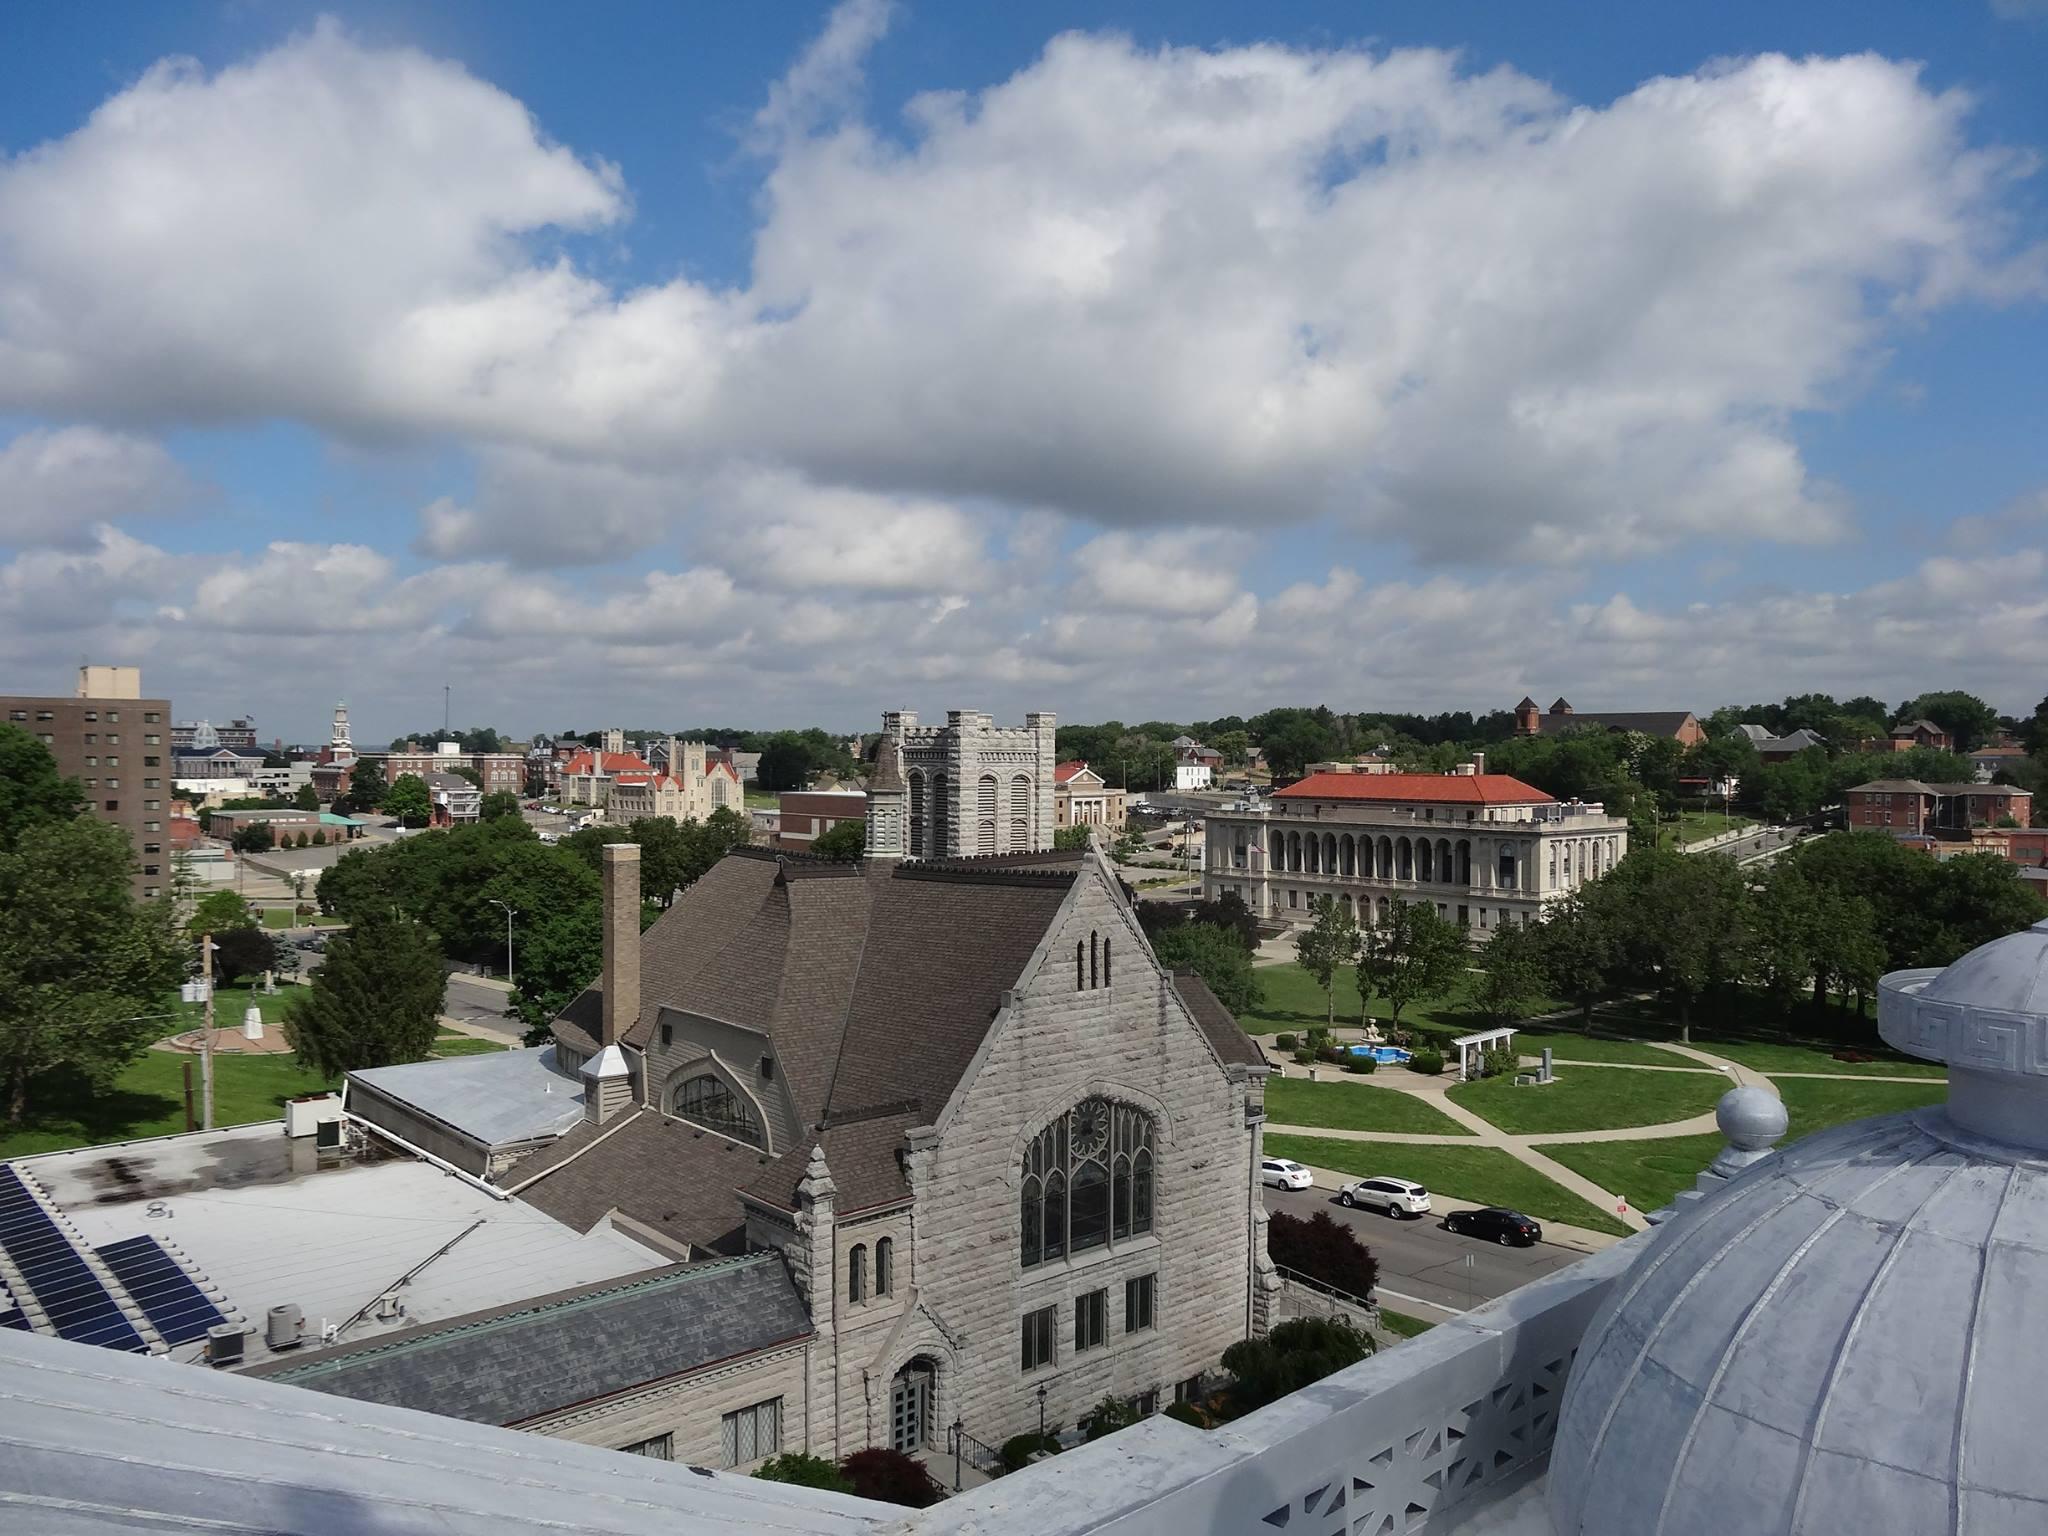 City Hall St. Joseph Mo Ariel View